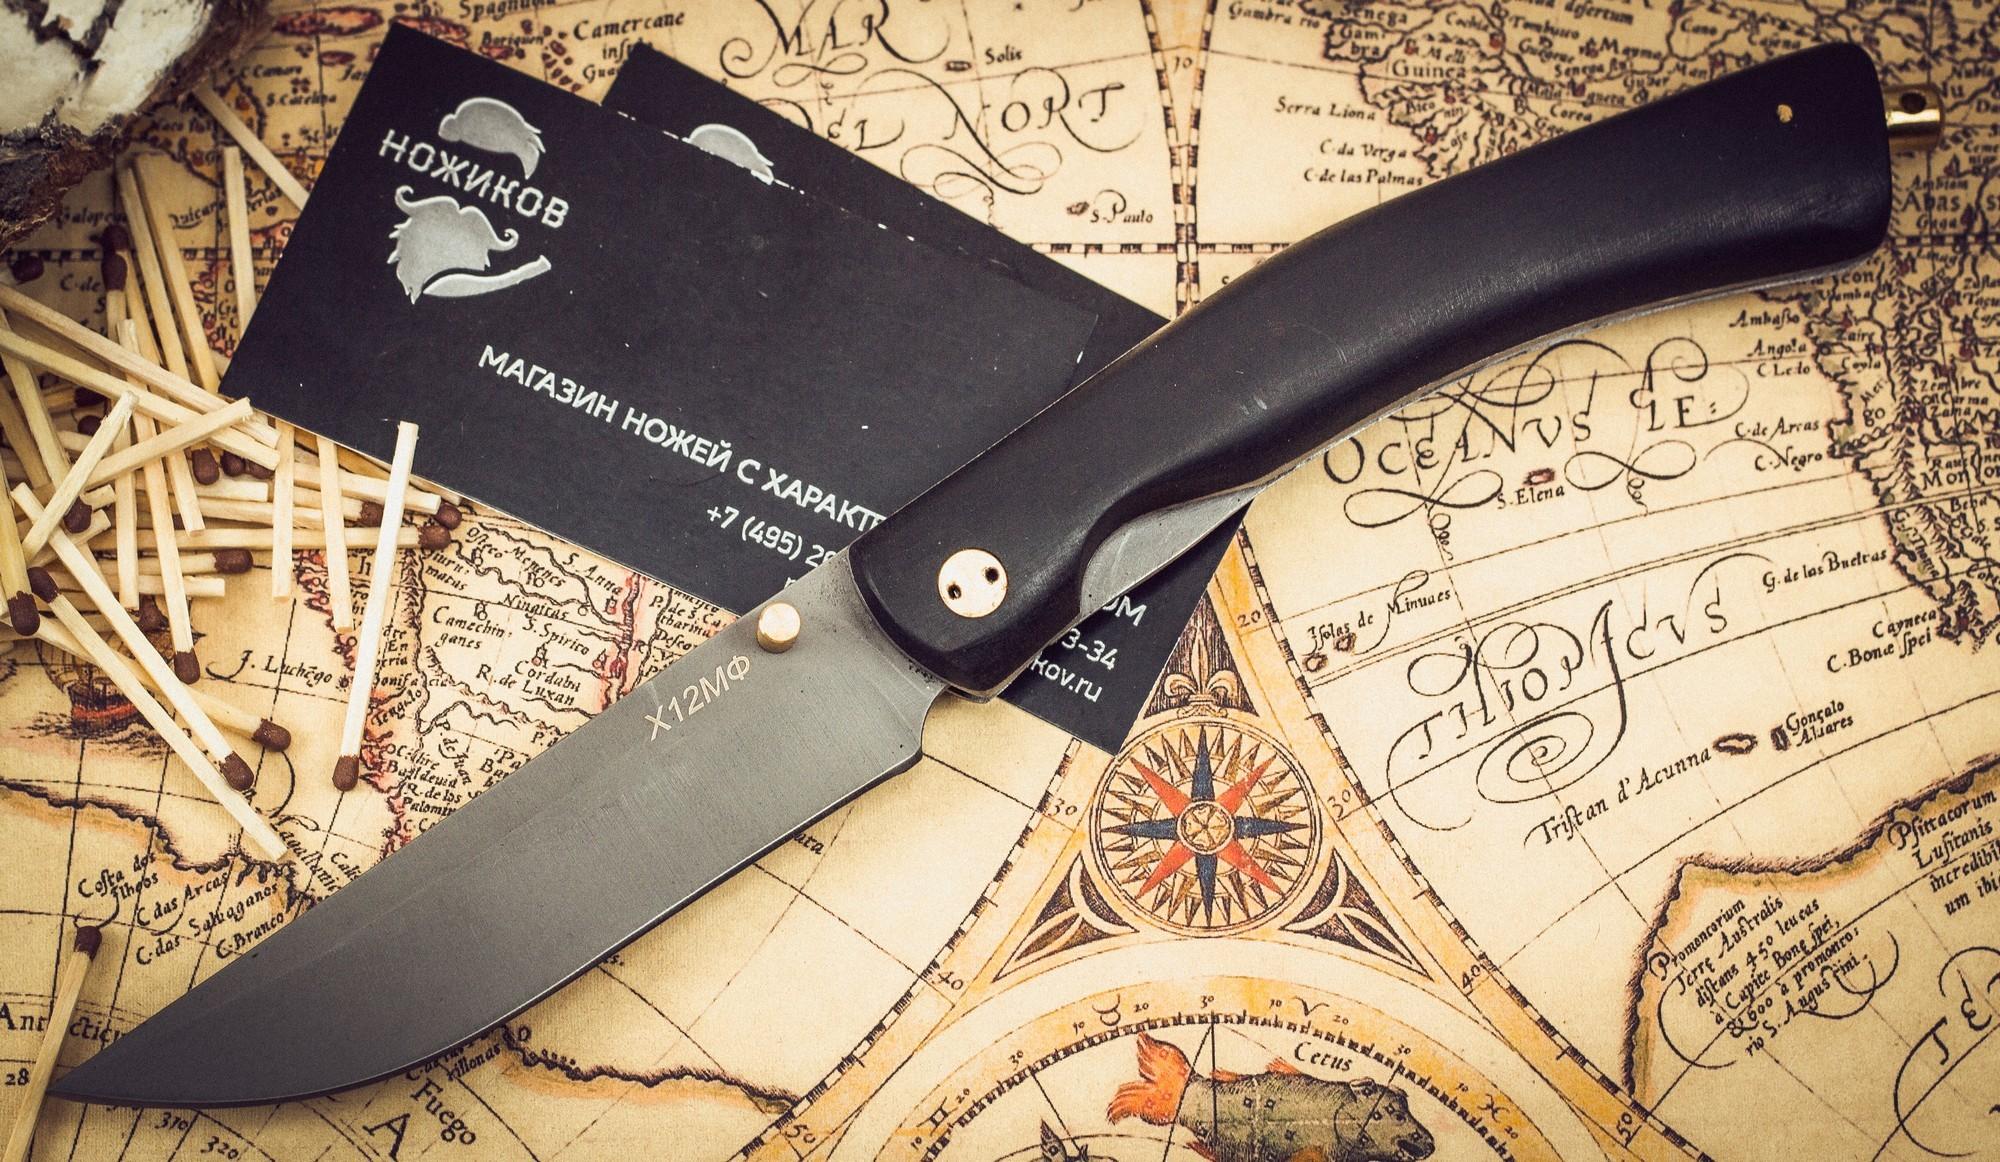 Складной нож Кайрос, сталь Х12МФ, граб складной нож лиса 1 х12мф